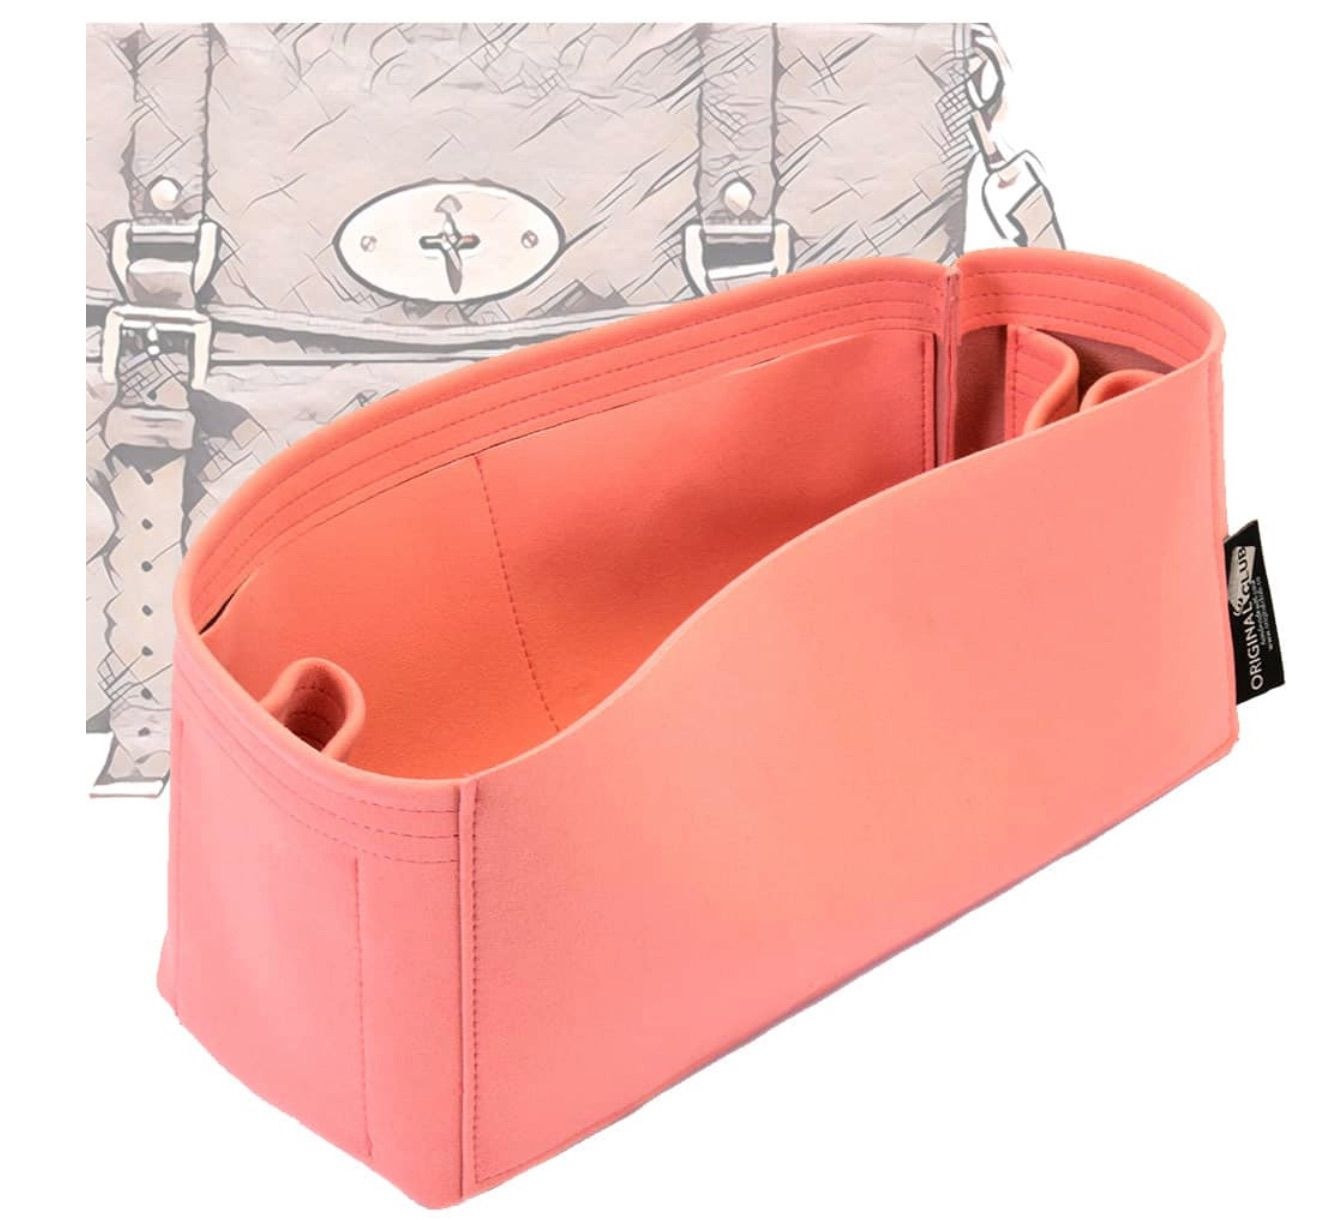 Alexa Suedette Regular Style Leather Handbag Organizer